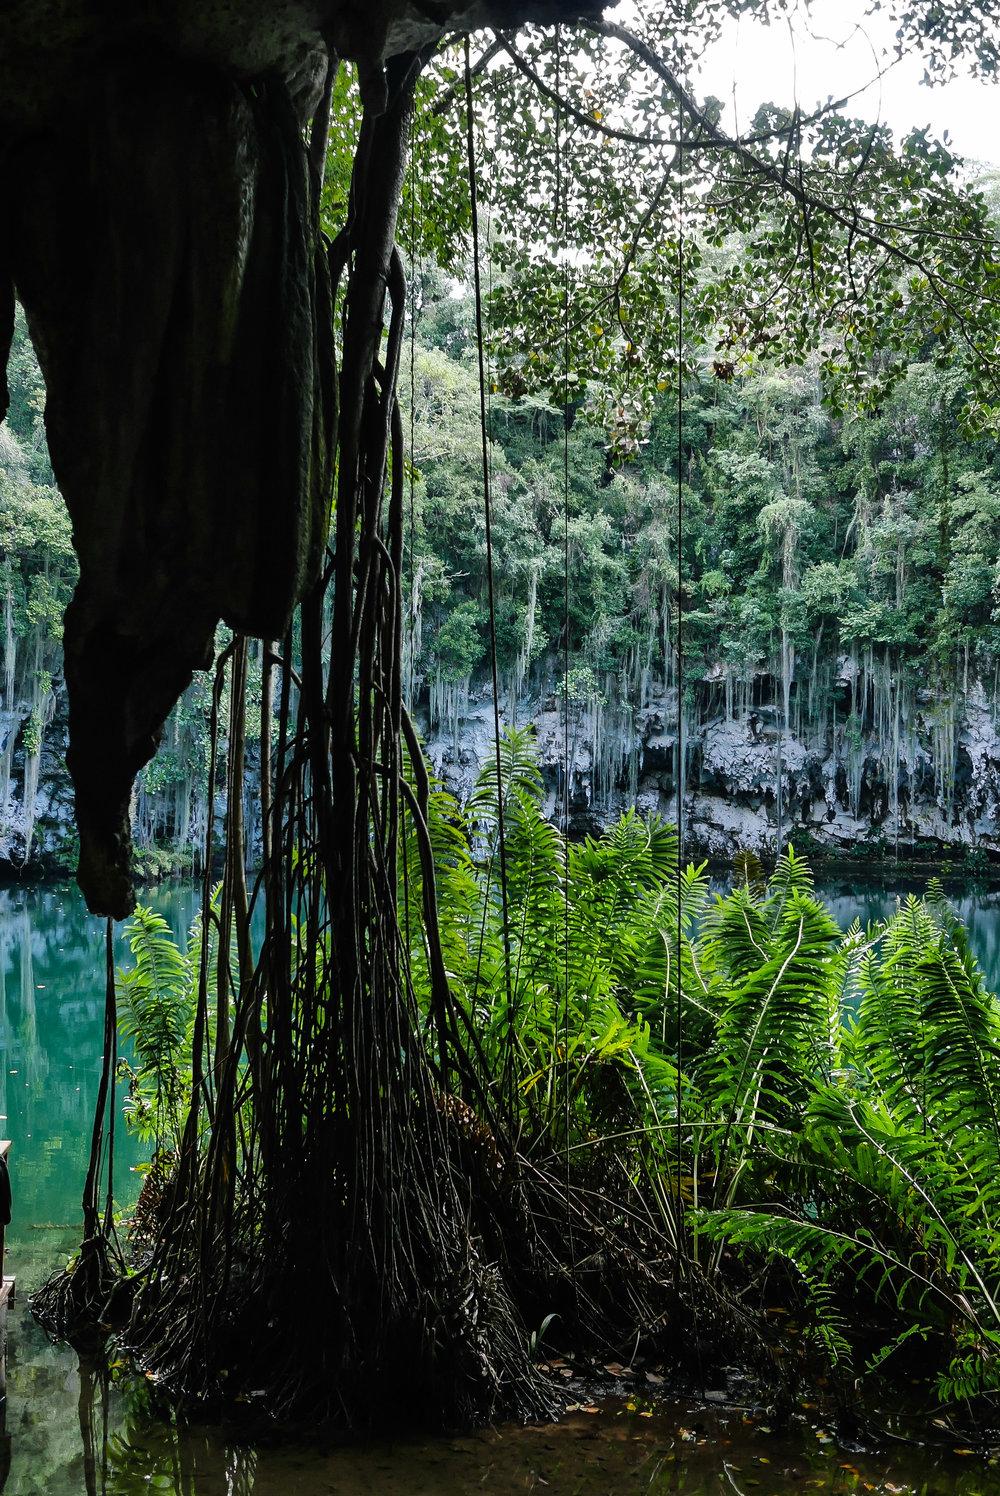 MYBELONGING-TOMMYLEI-DOMINICAN-REPUBLIC-LOS-TRES-OJOS-THREE-EYES-NATIONAL-PARK-UNESCO-SANTO-DOMINGO-TRAVEL-PHOTOGRAPHY-22.jpg